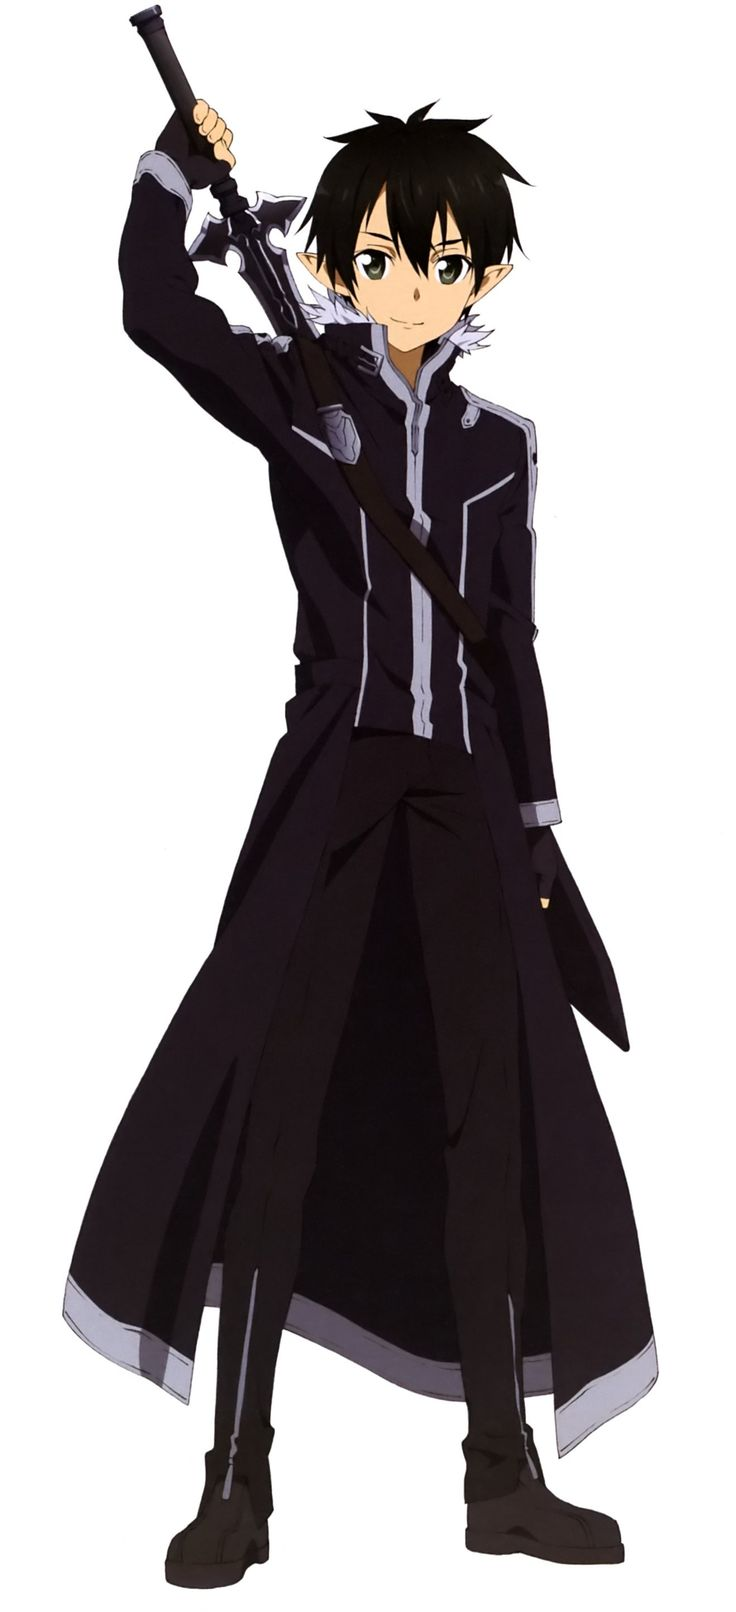 Sword Art Online, Kirito, official art